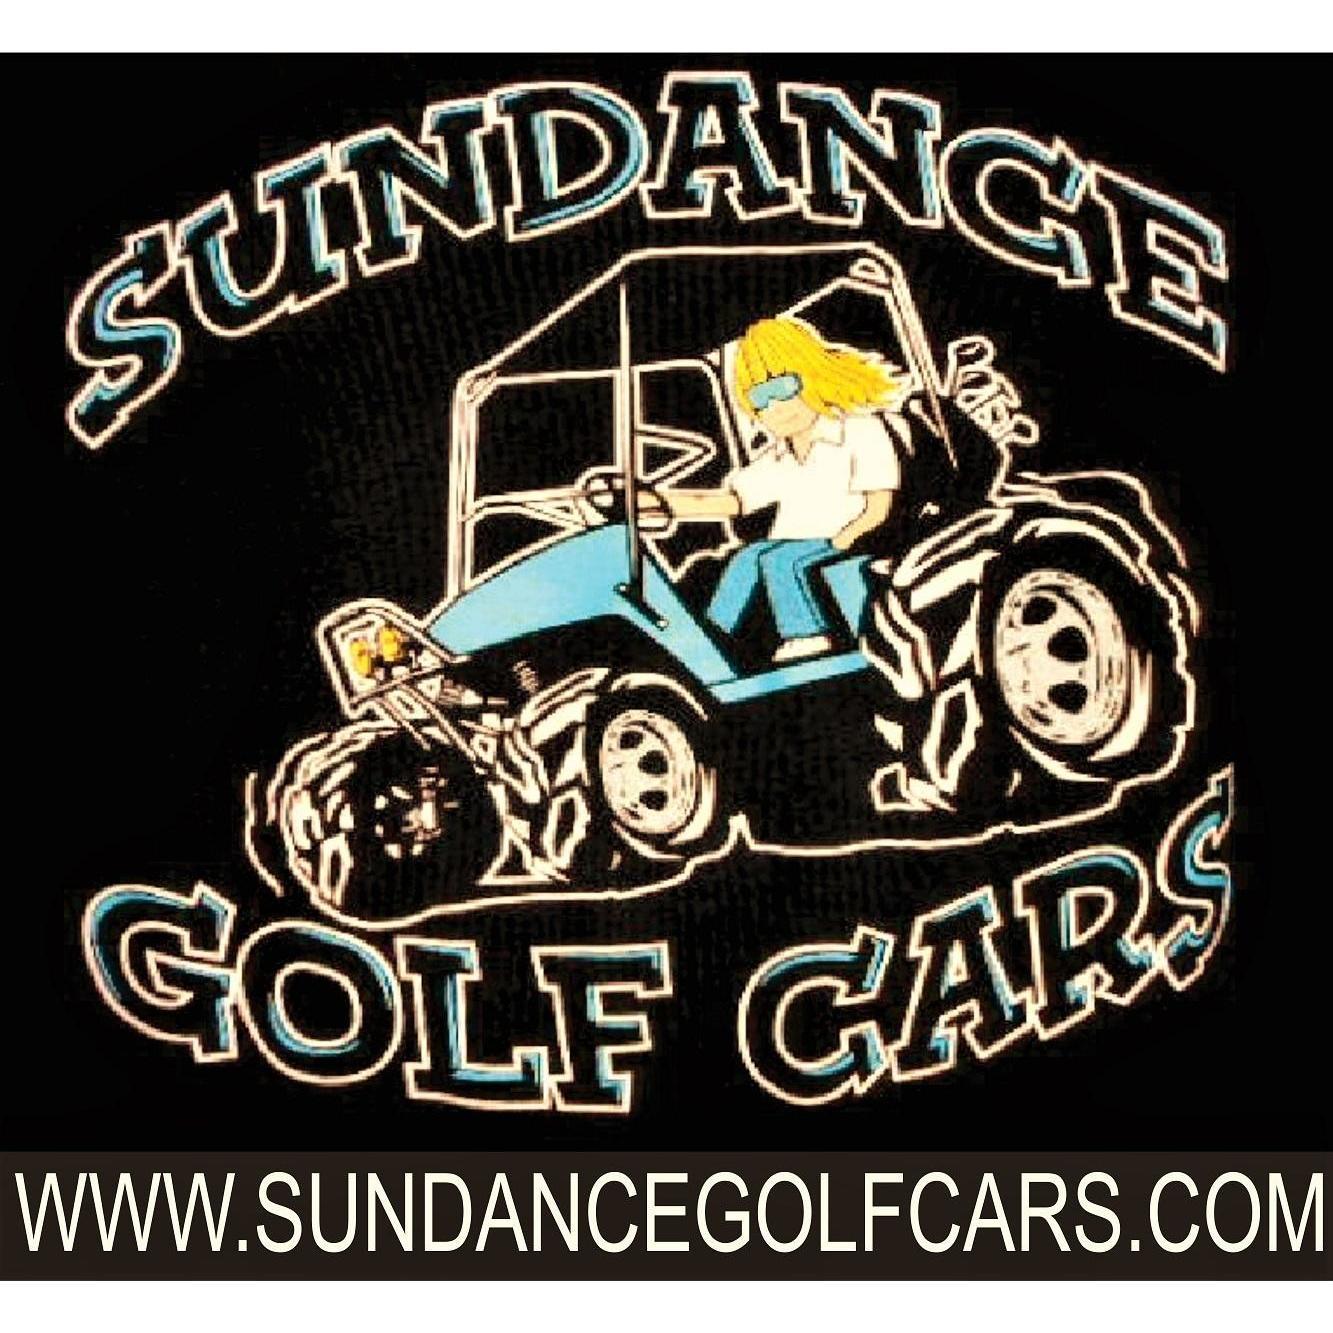 Sundance Custom Golf Carts - EL CAJON, CA - Motorcycles & Scooters